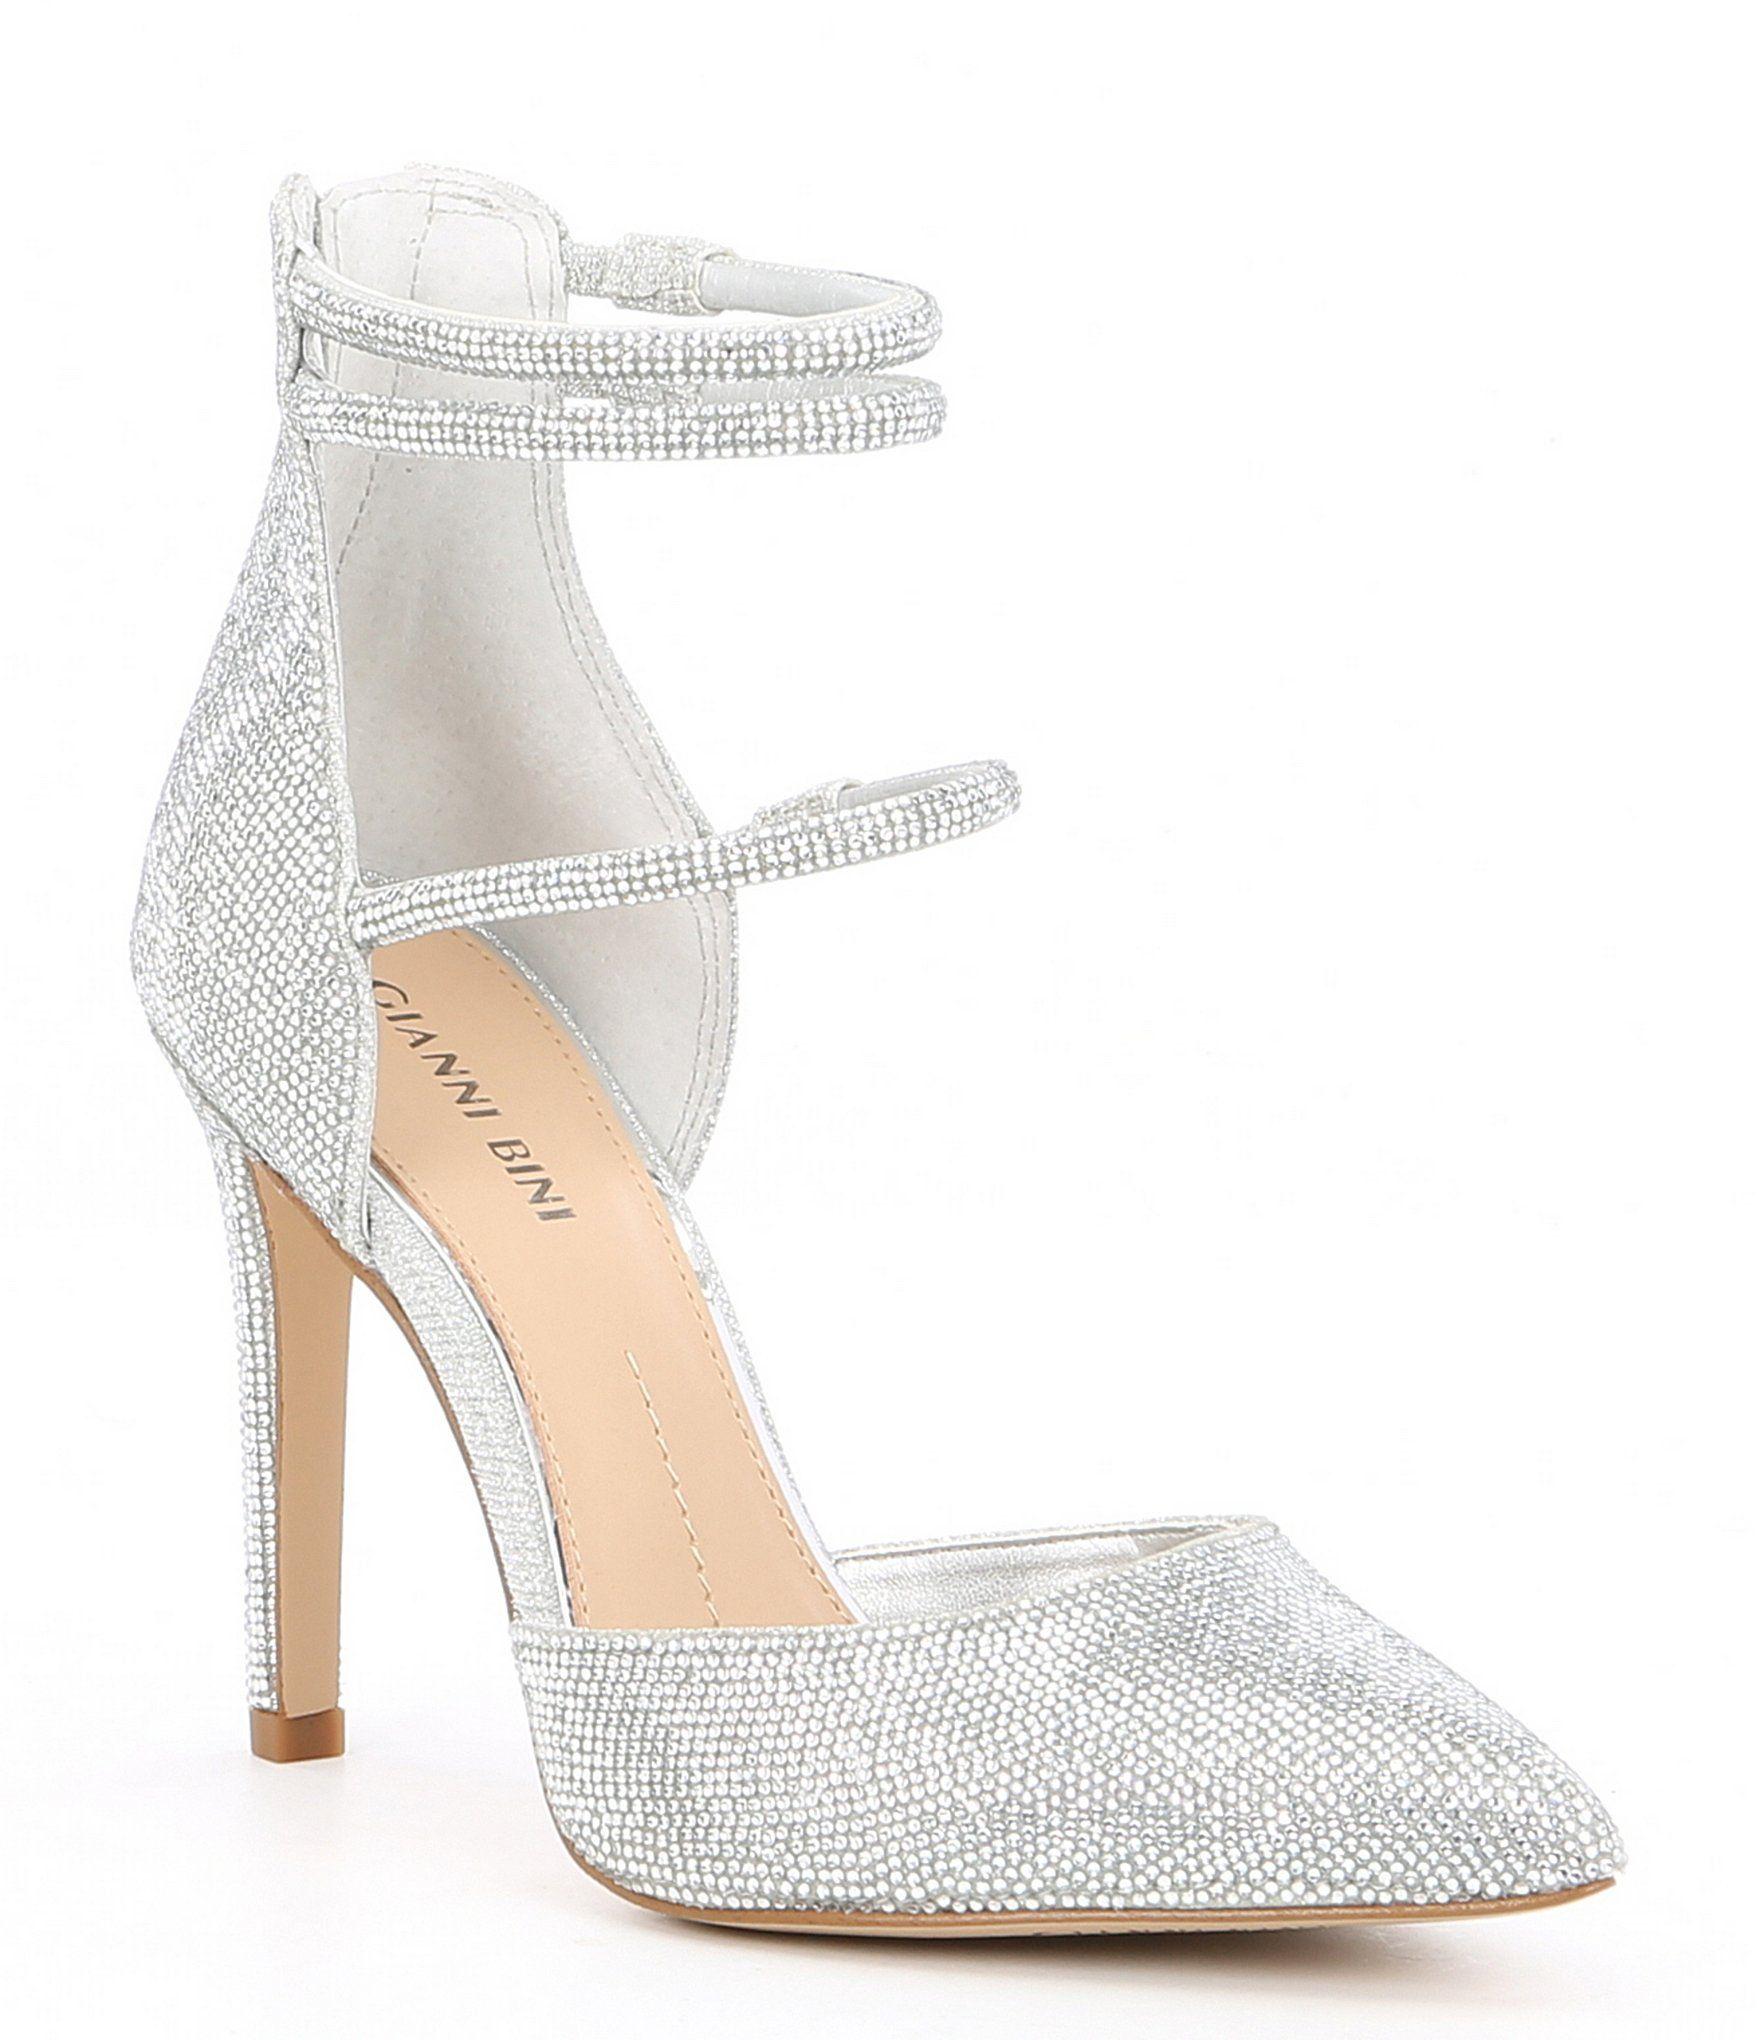 Dillards Wedding Gifts: Gianni Bini Anyssah Strappy Jeweled Pumps In 2020